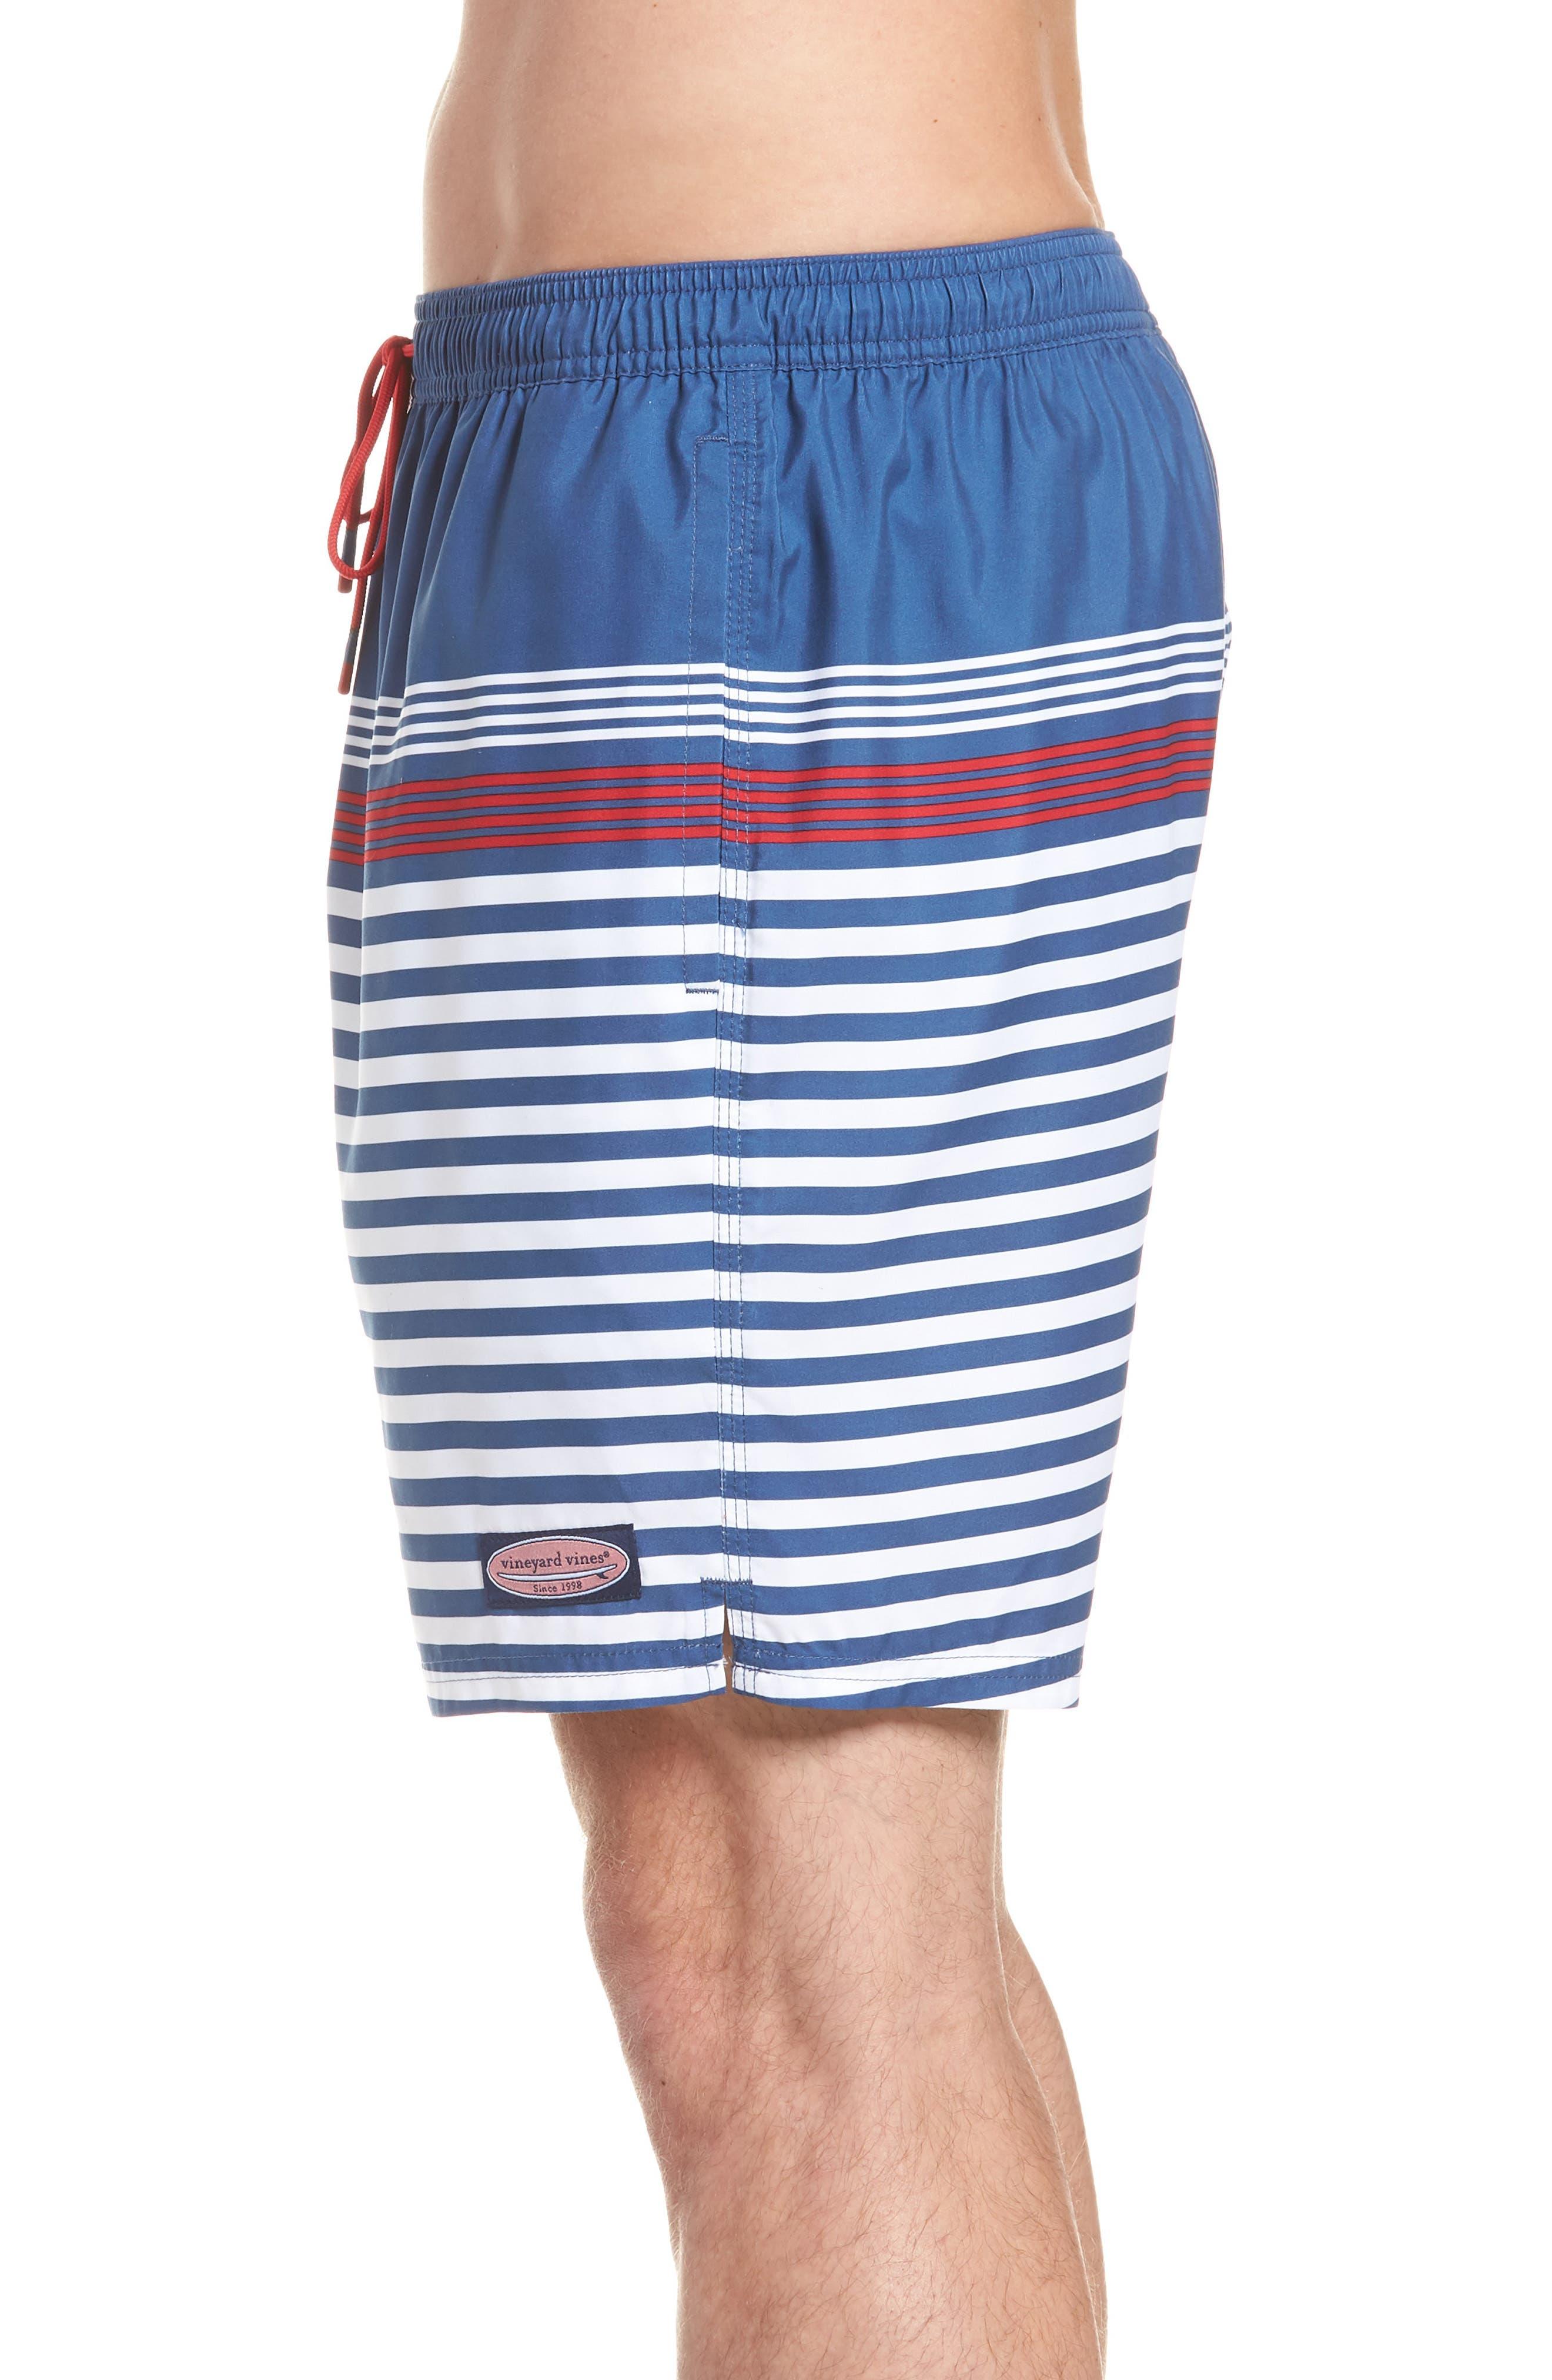 Chappy Summerall Stripe Swim Trunks,                             Alternate thumbnail 3, color,                             461